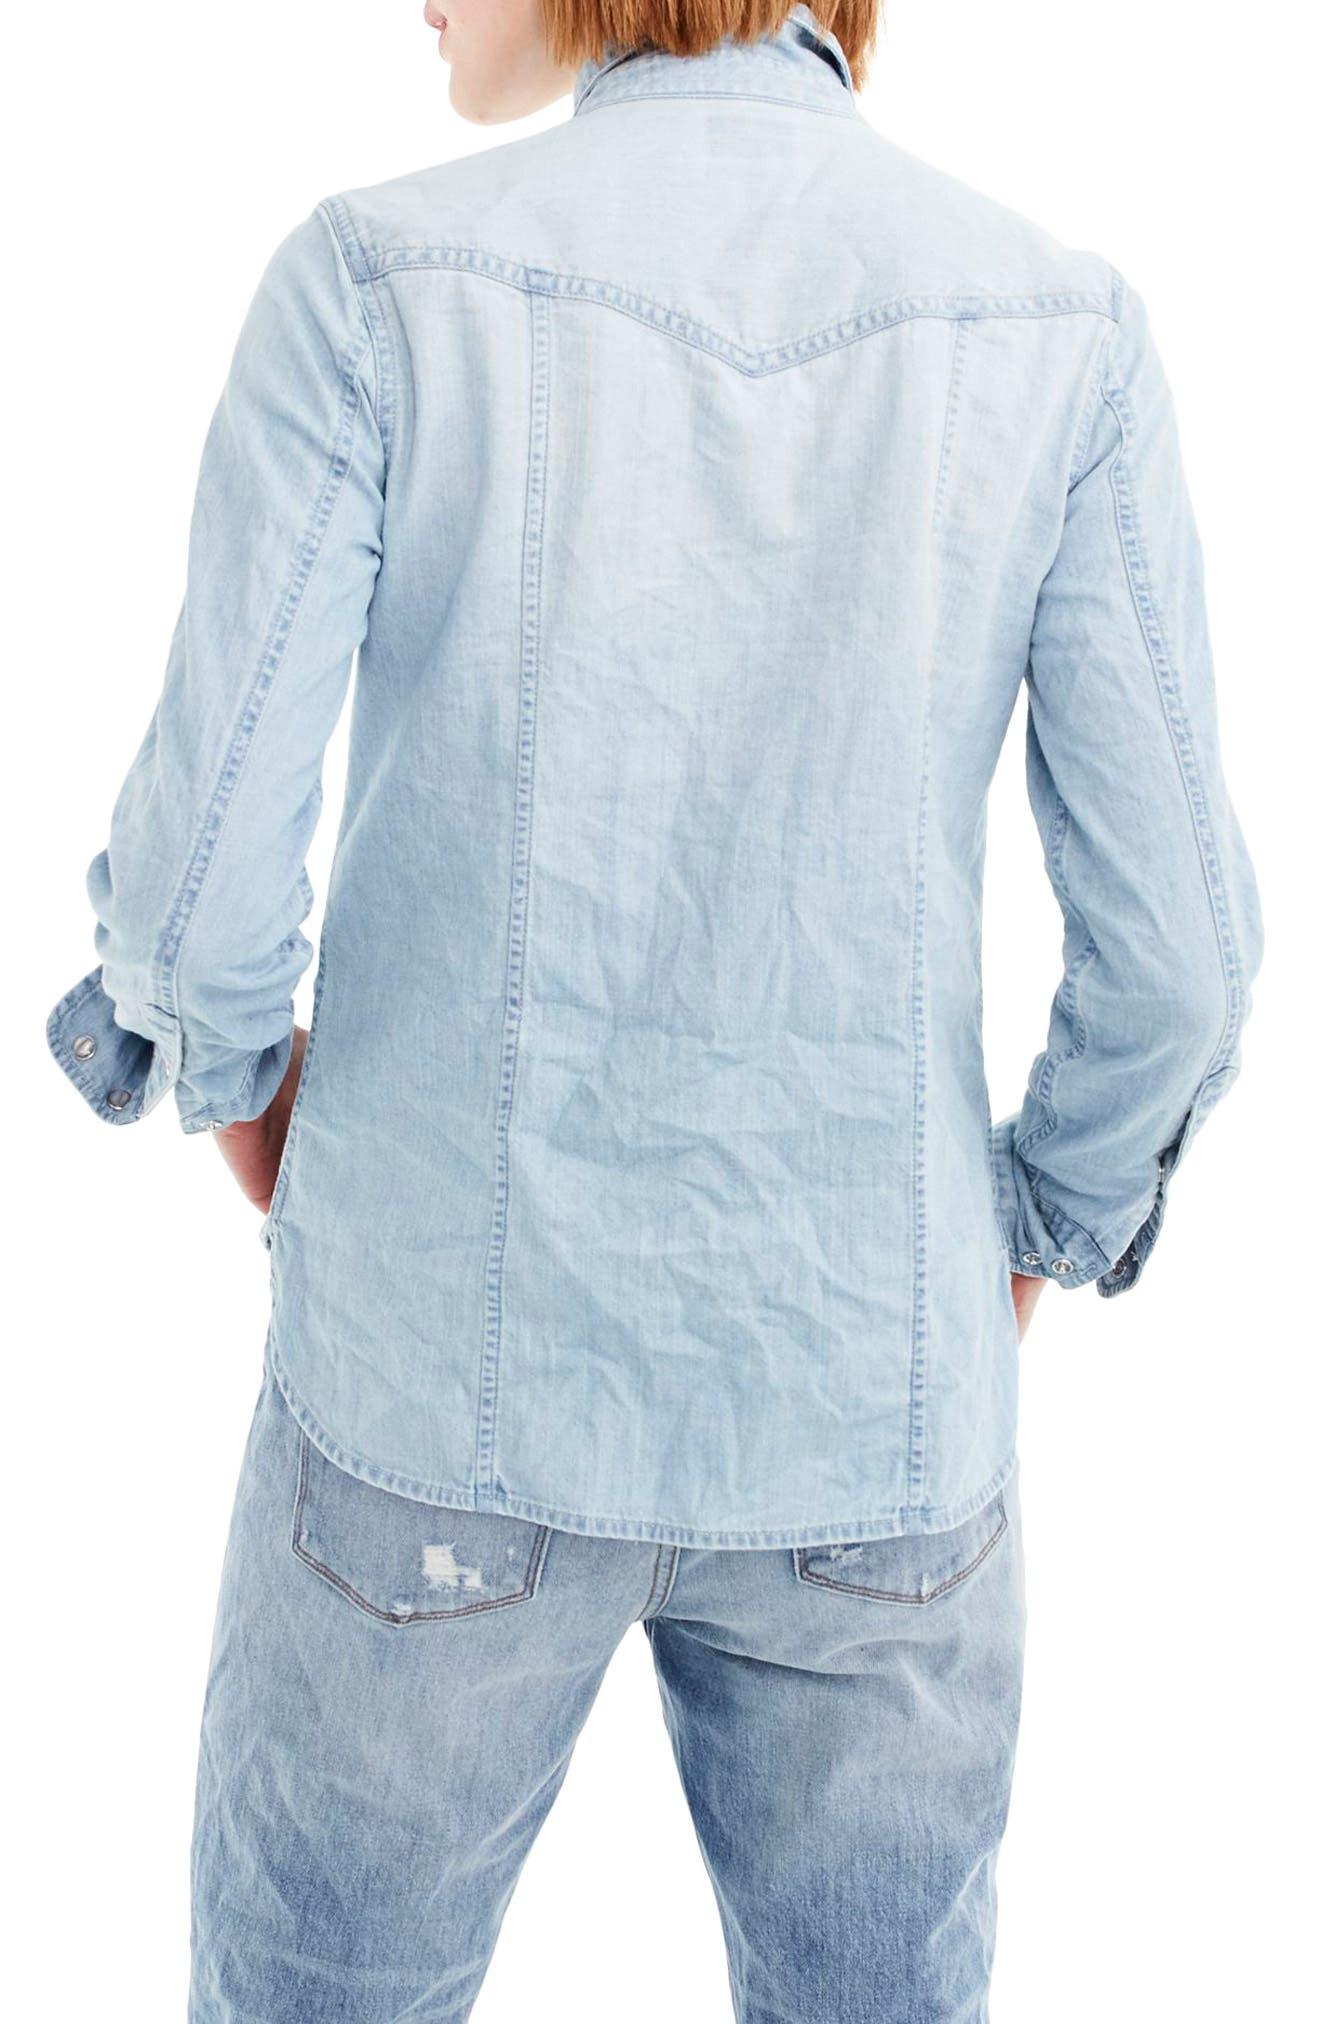 Light Wash Western Shirt,                             Alternate thumbnail 3, color,                             Clover Wash